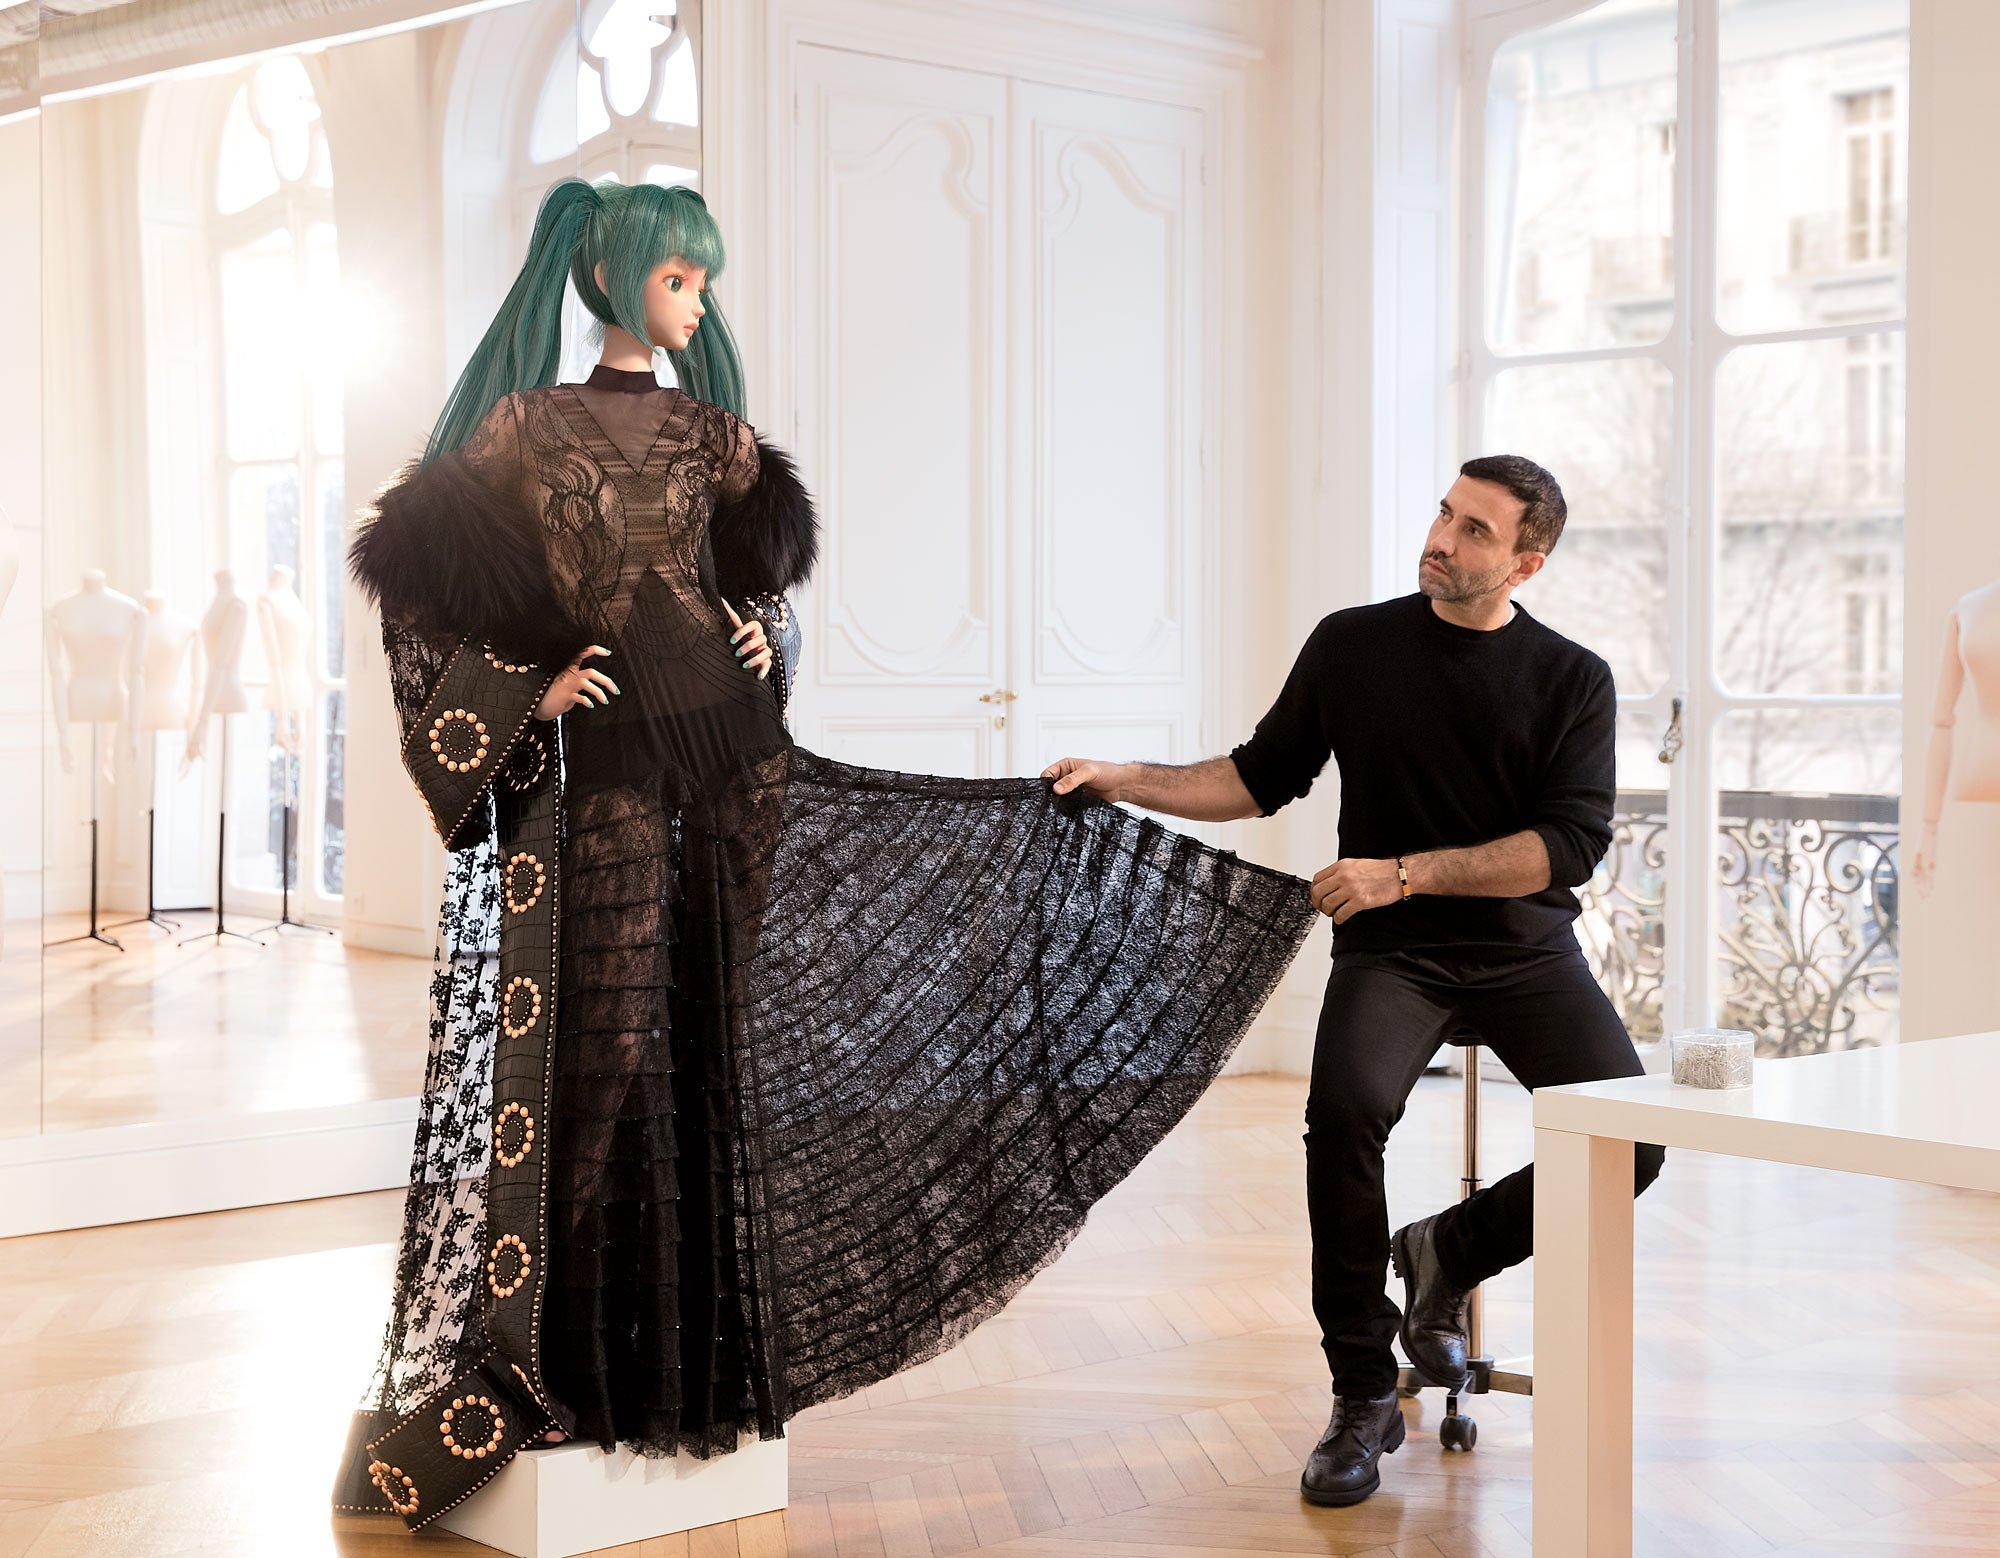 NekoPOP-Hatsune-Miku-Vogue-Riccardo-Tisci-Givenchy-Met-Gala